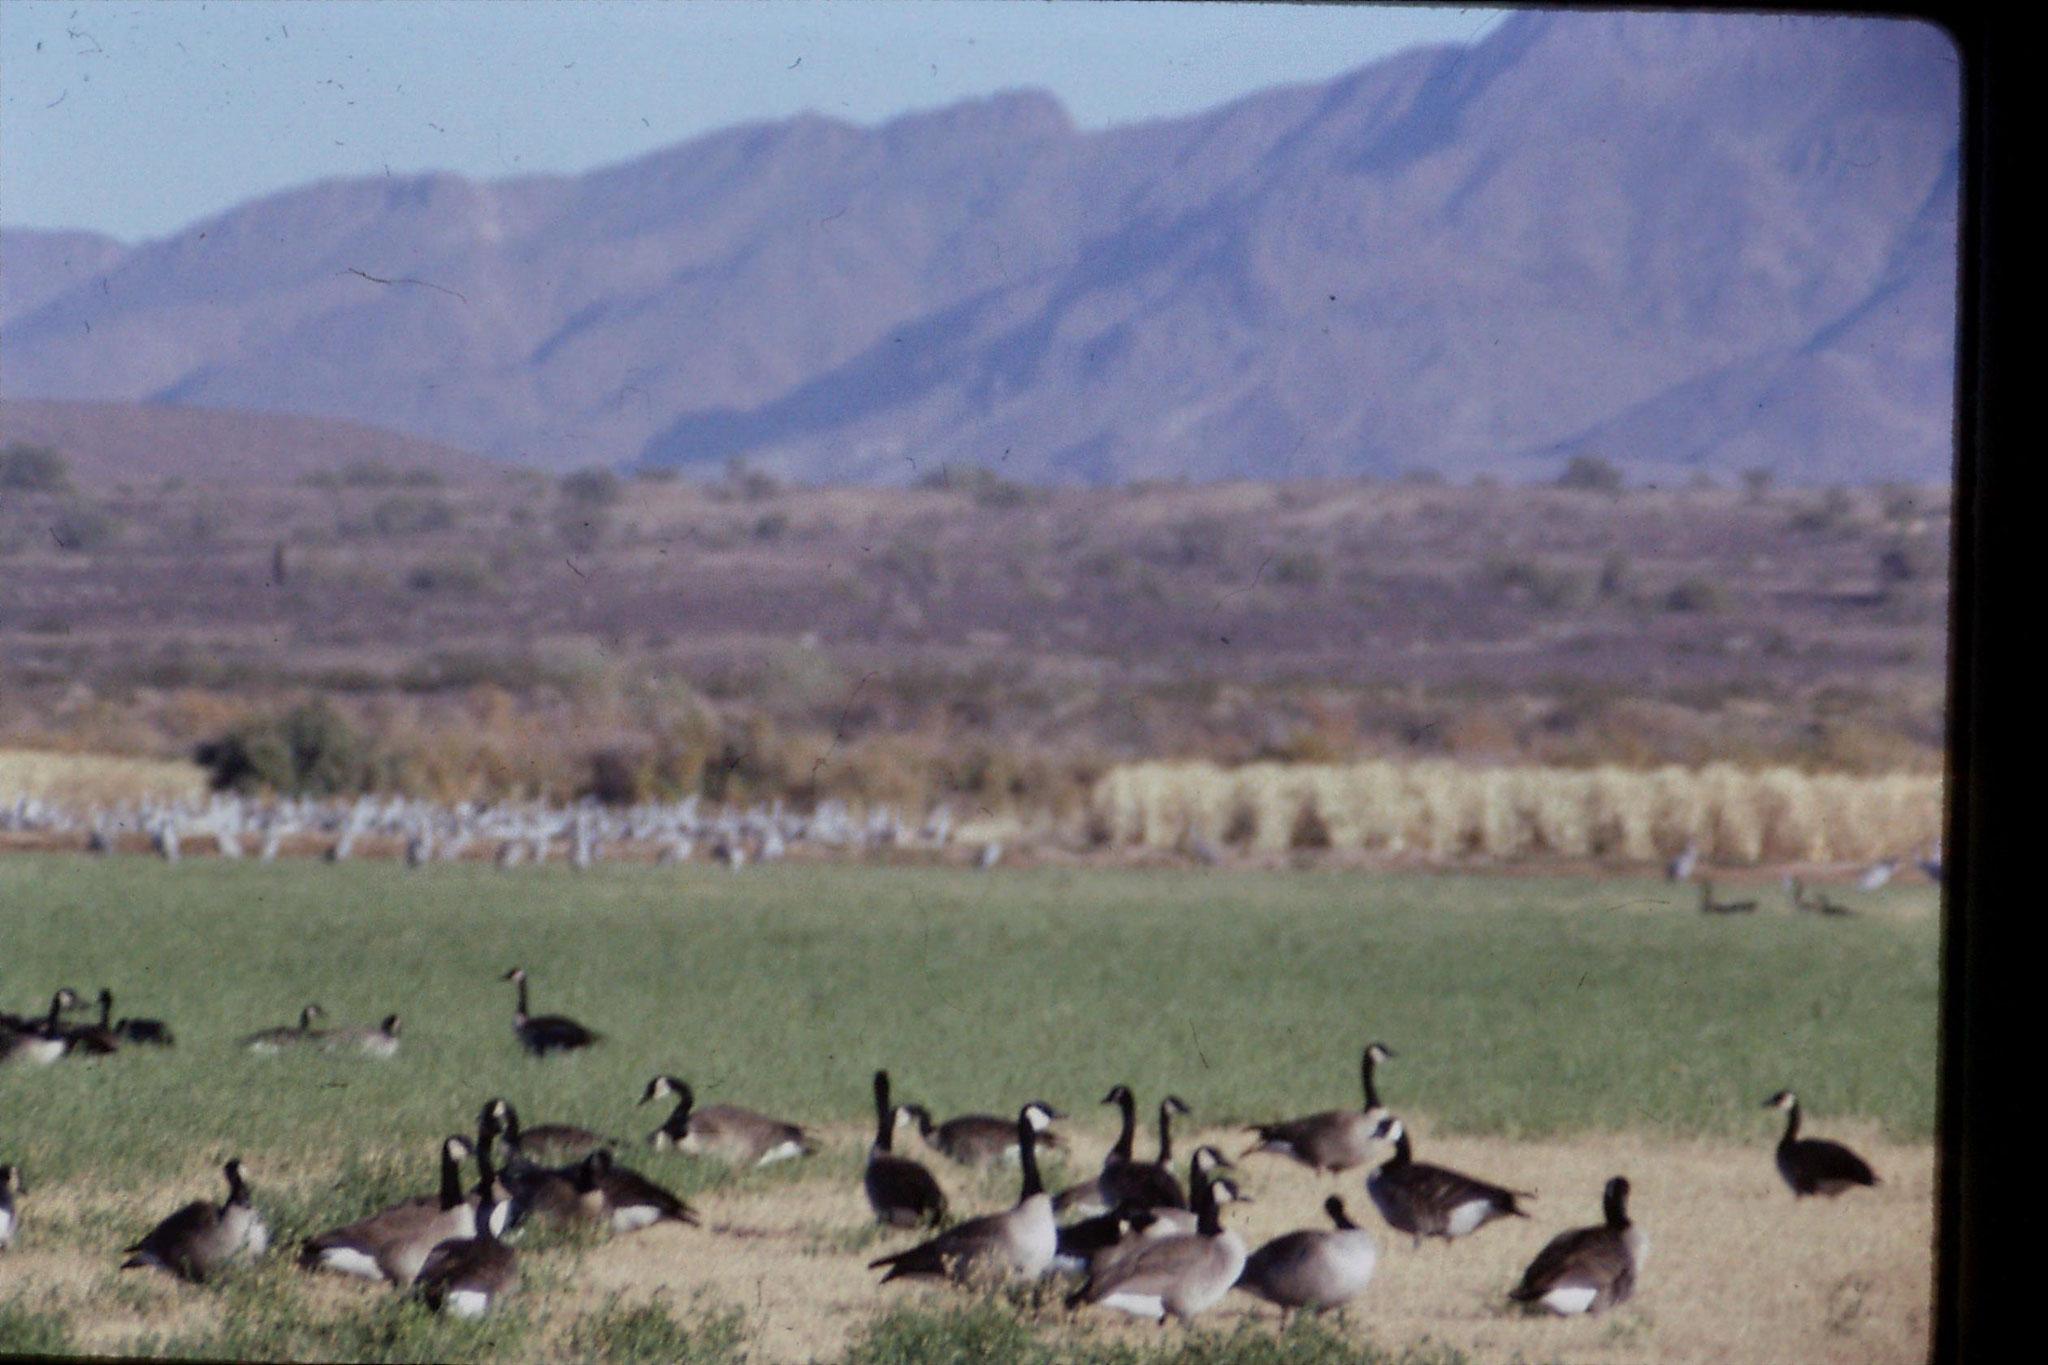 10/12/1990: 5: Cibola WR, Canada geese and cranes